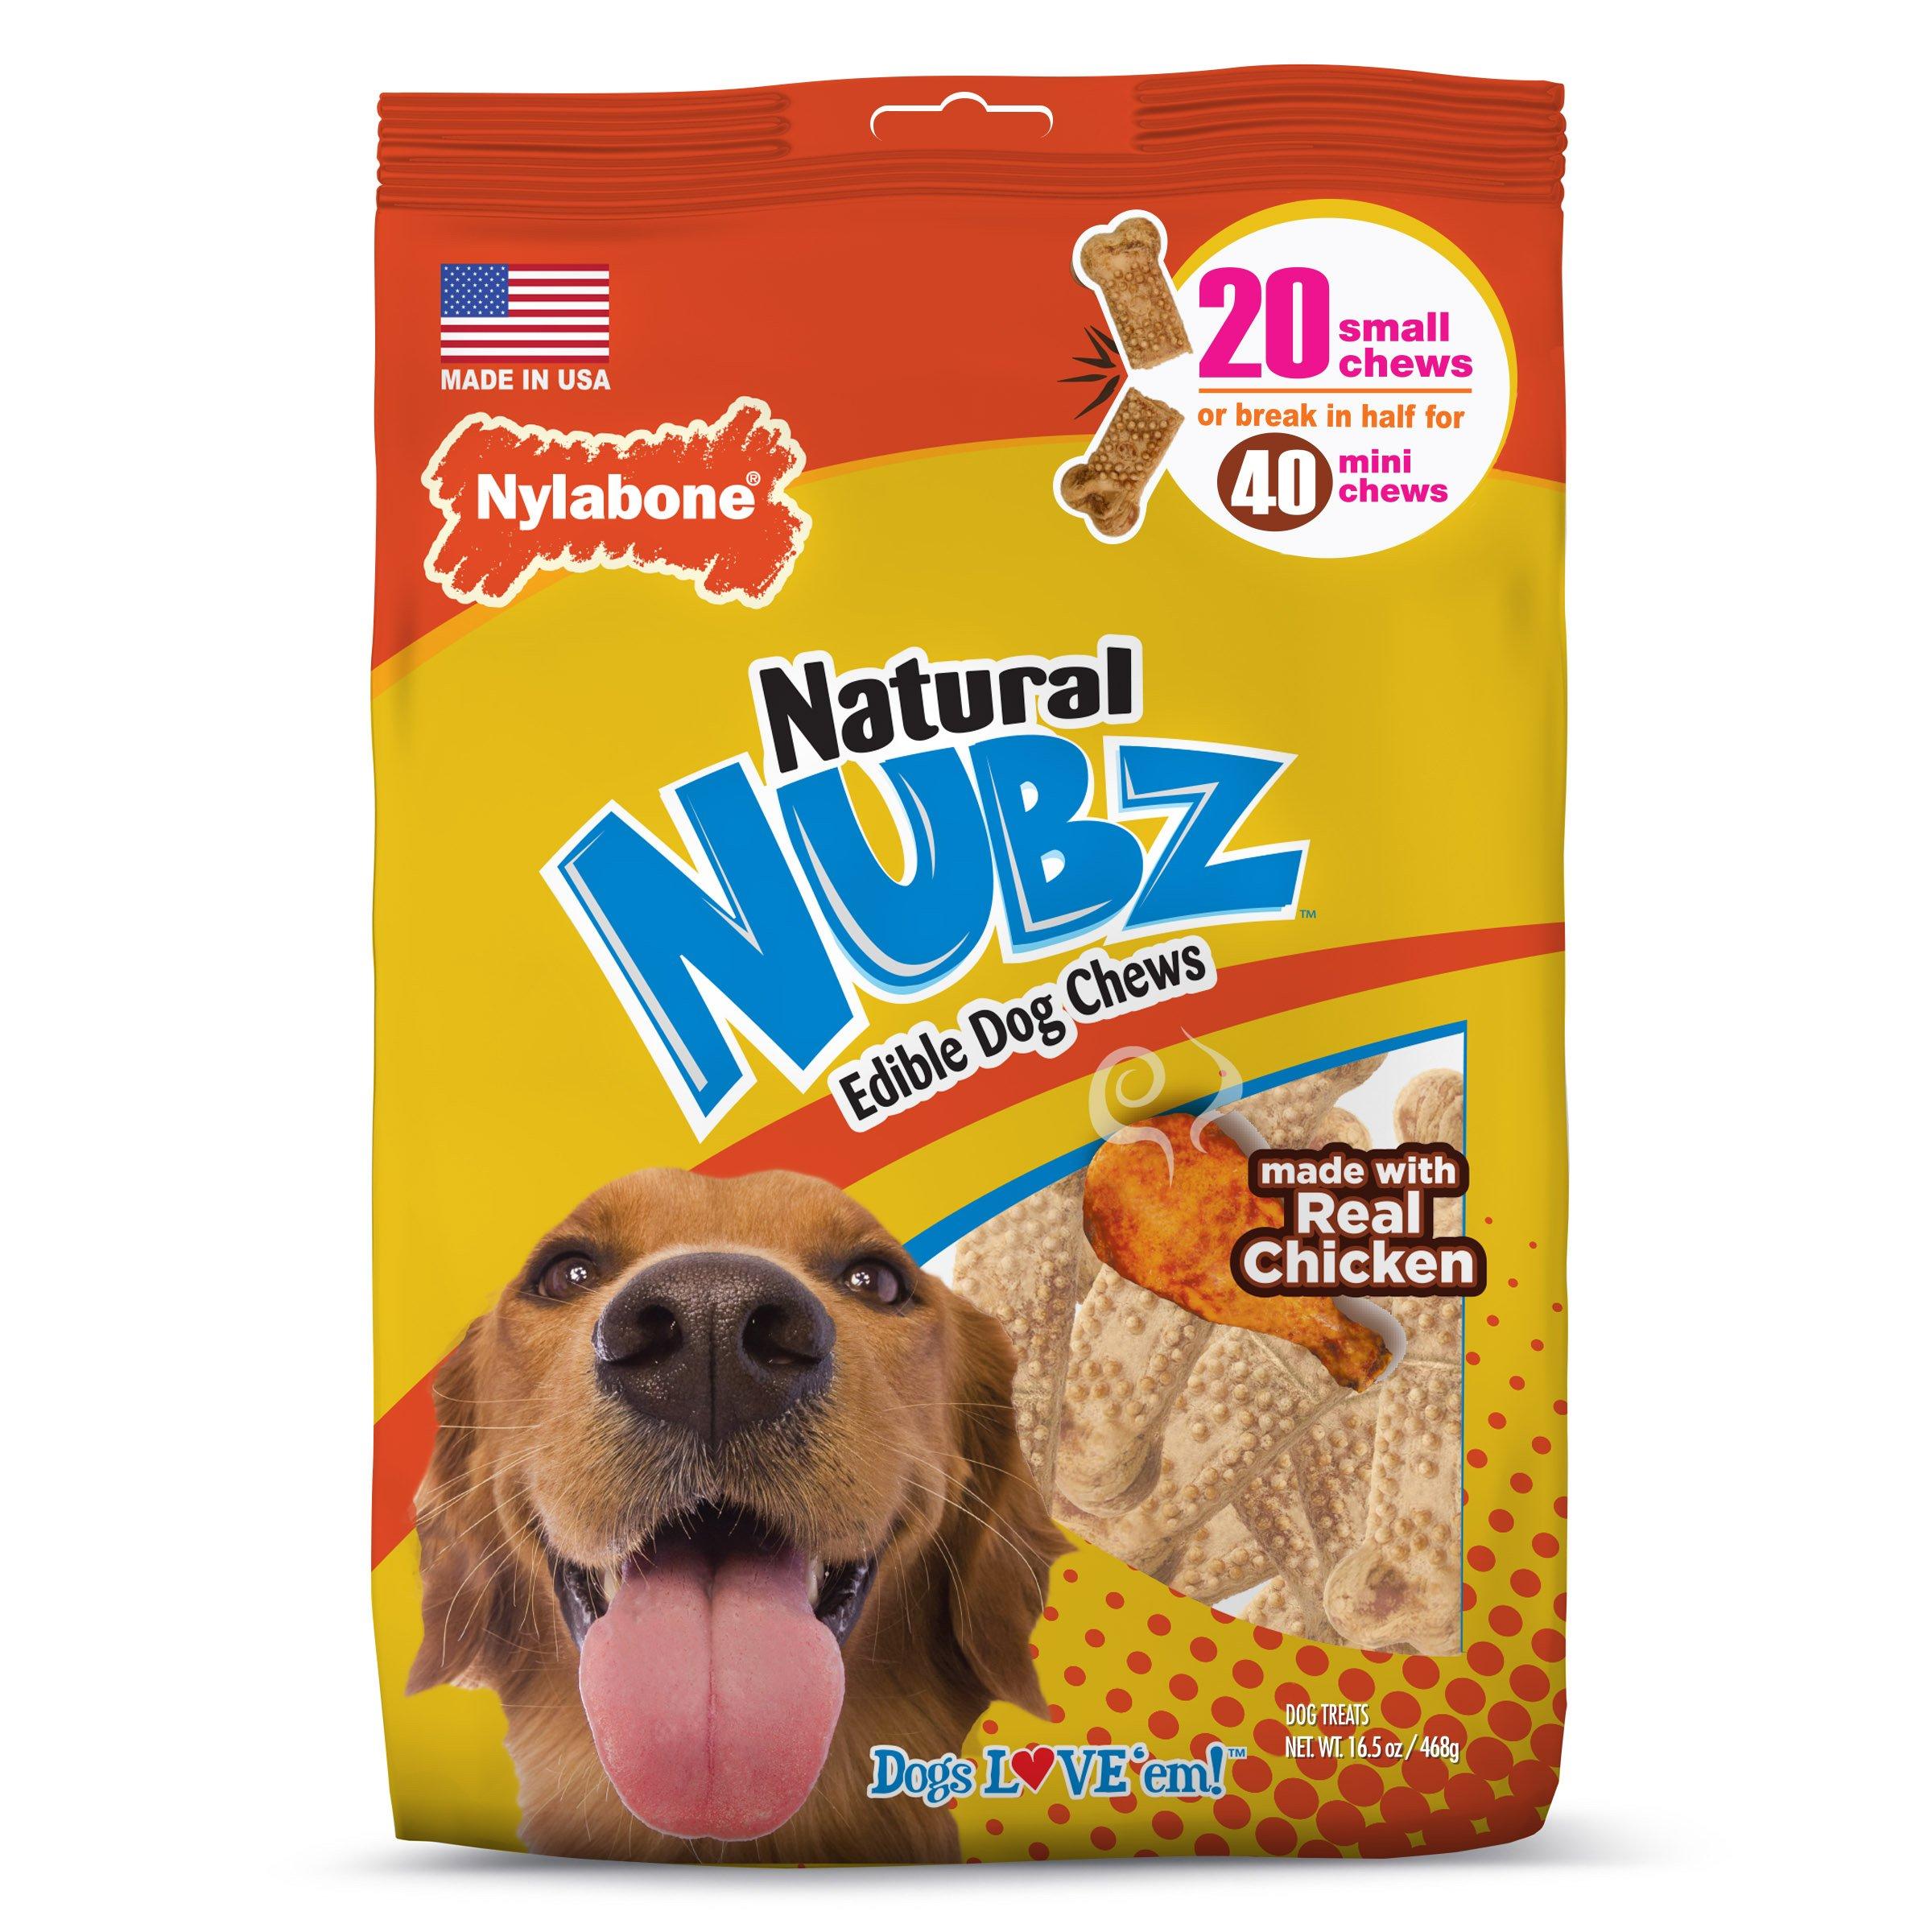 Nylabone Nubz Natural Eddible Dog Chew Treats